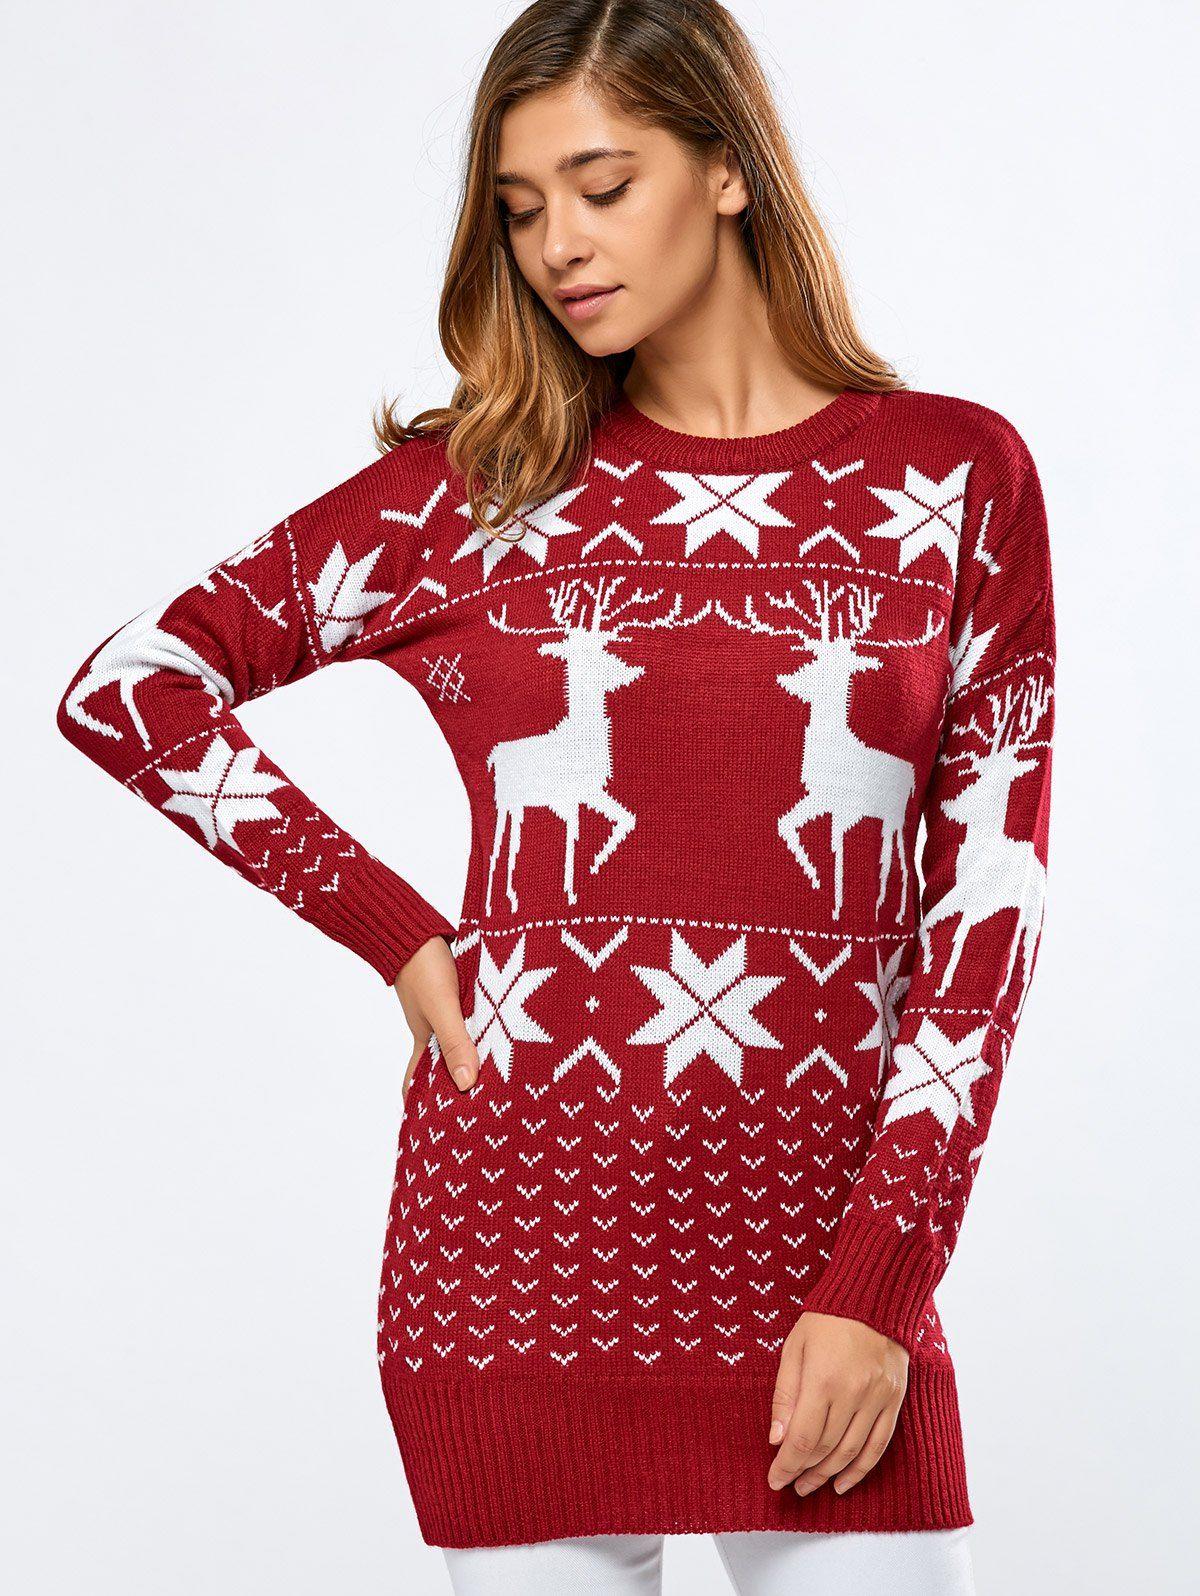 38++ Christmas sweater dress ideas